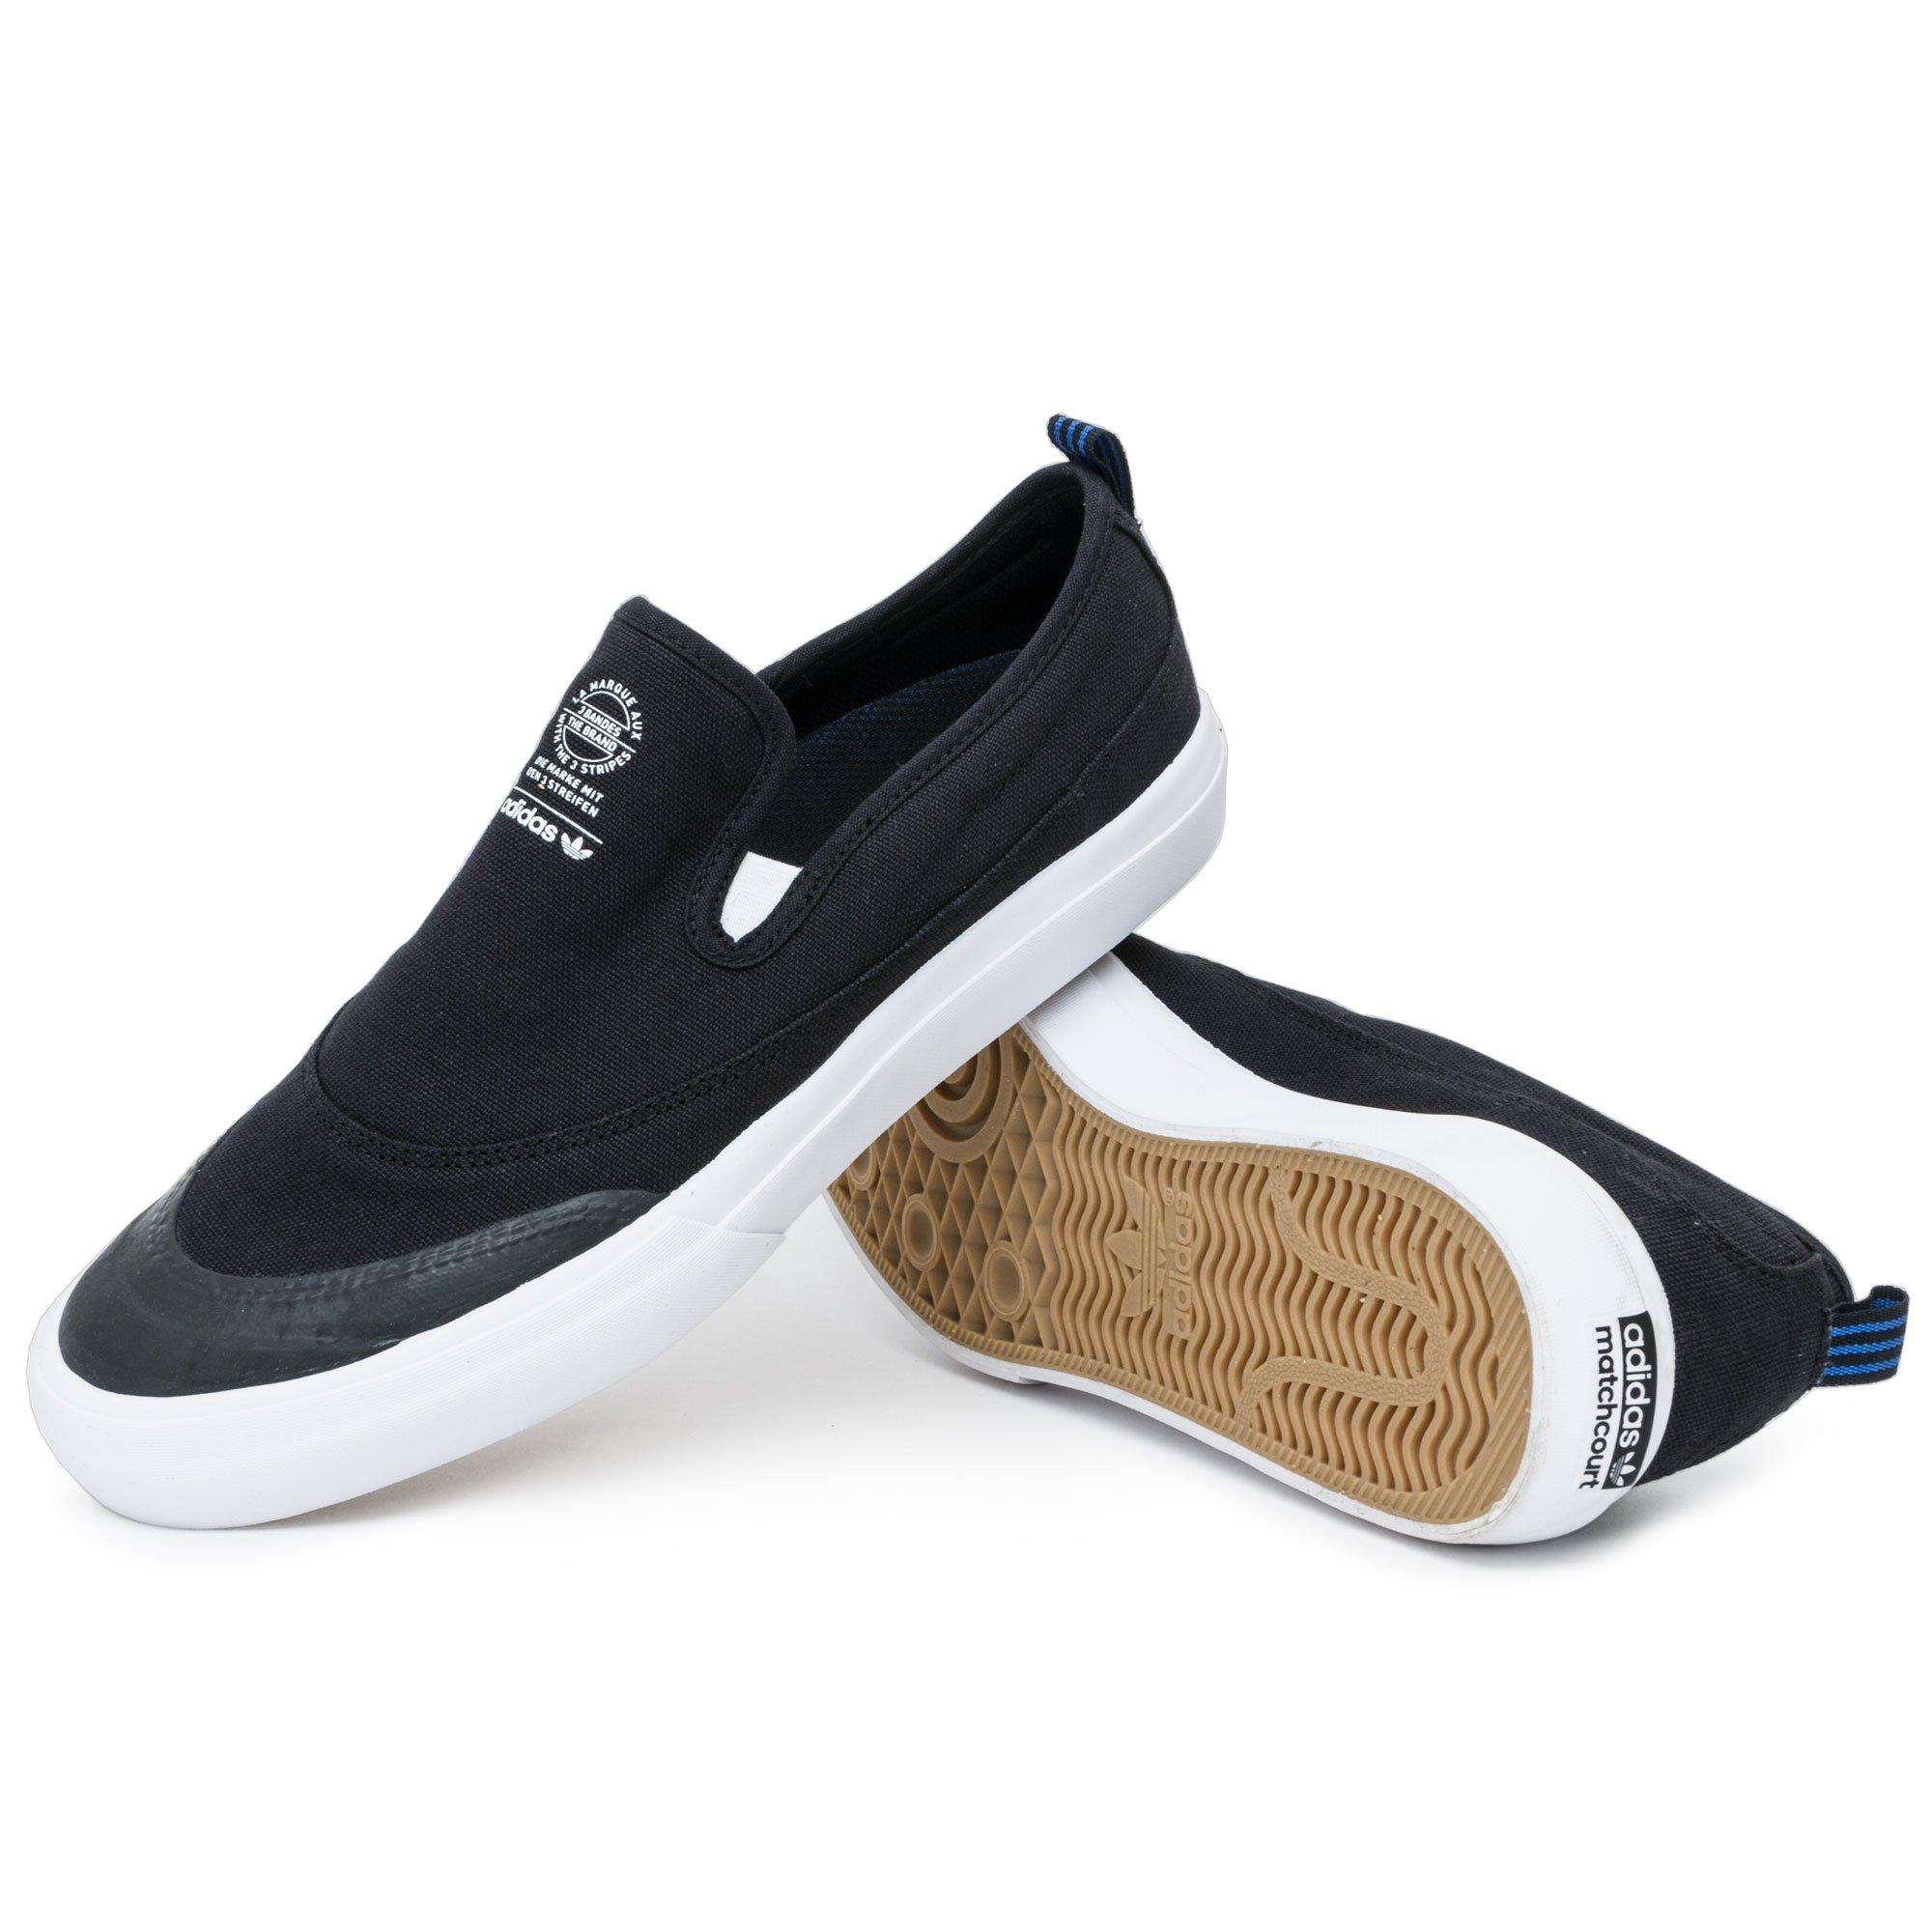 adidas Rubber Matchcourt Slip On Shoes